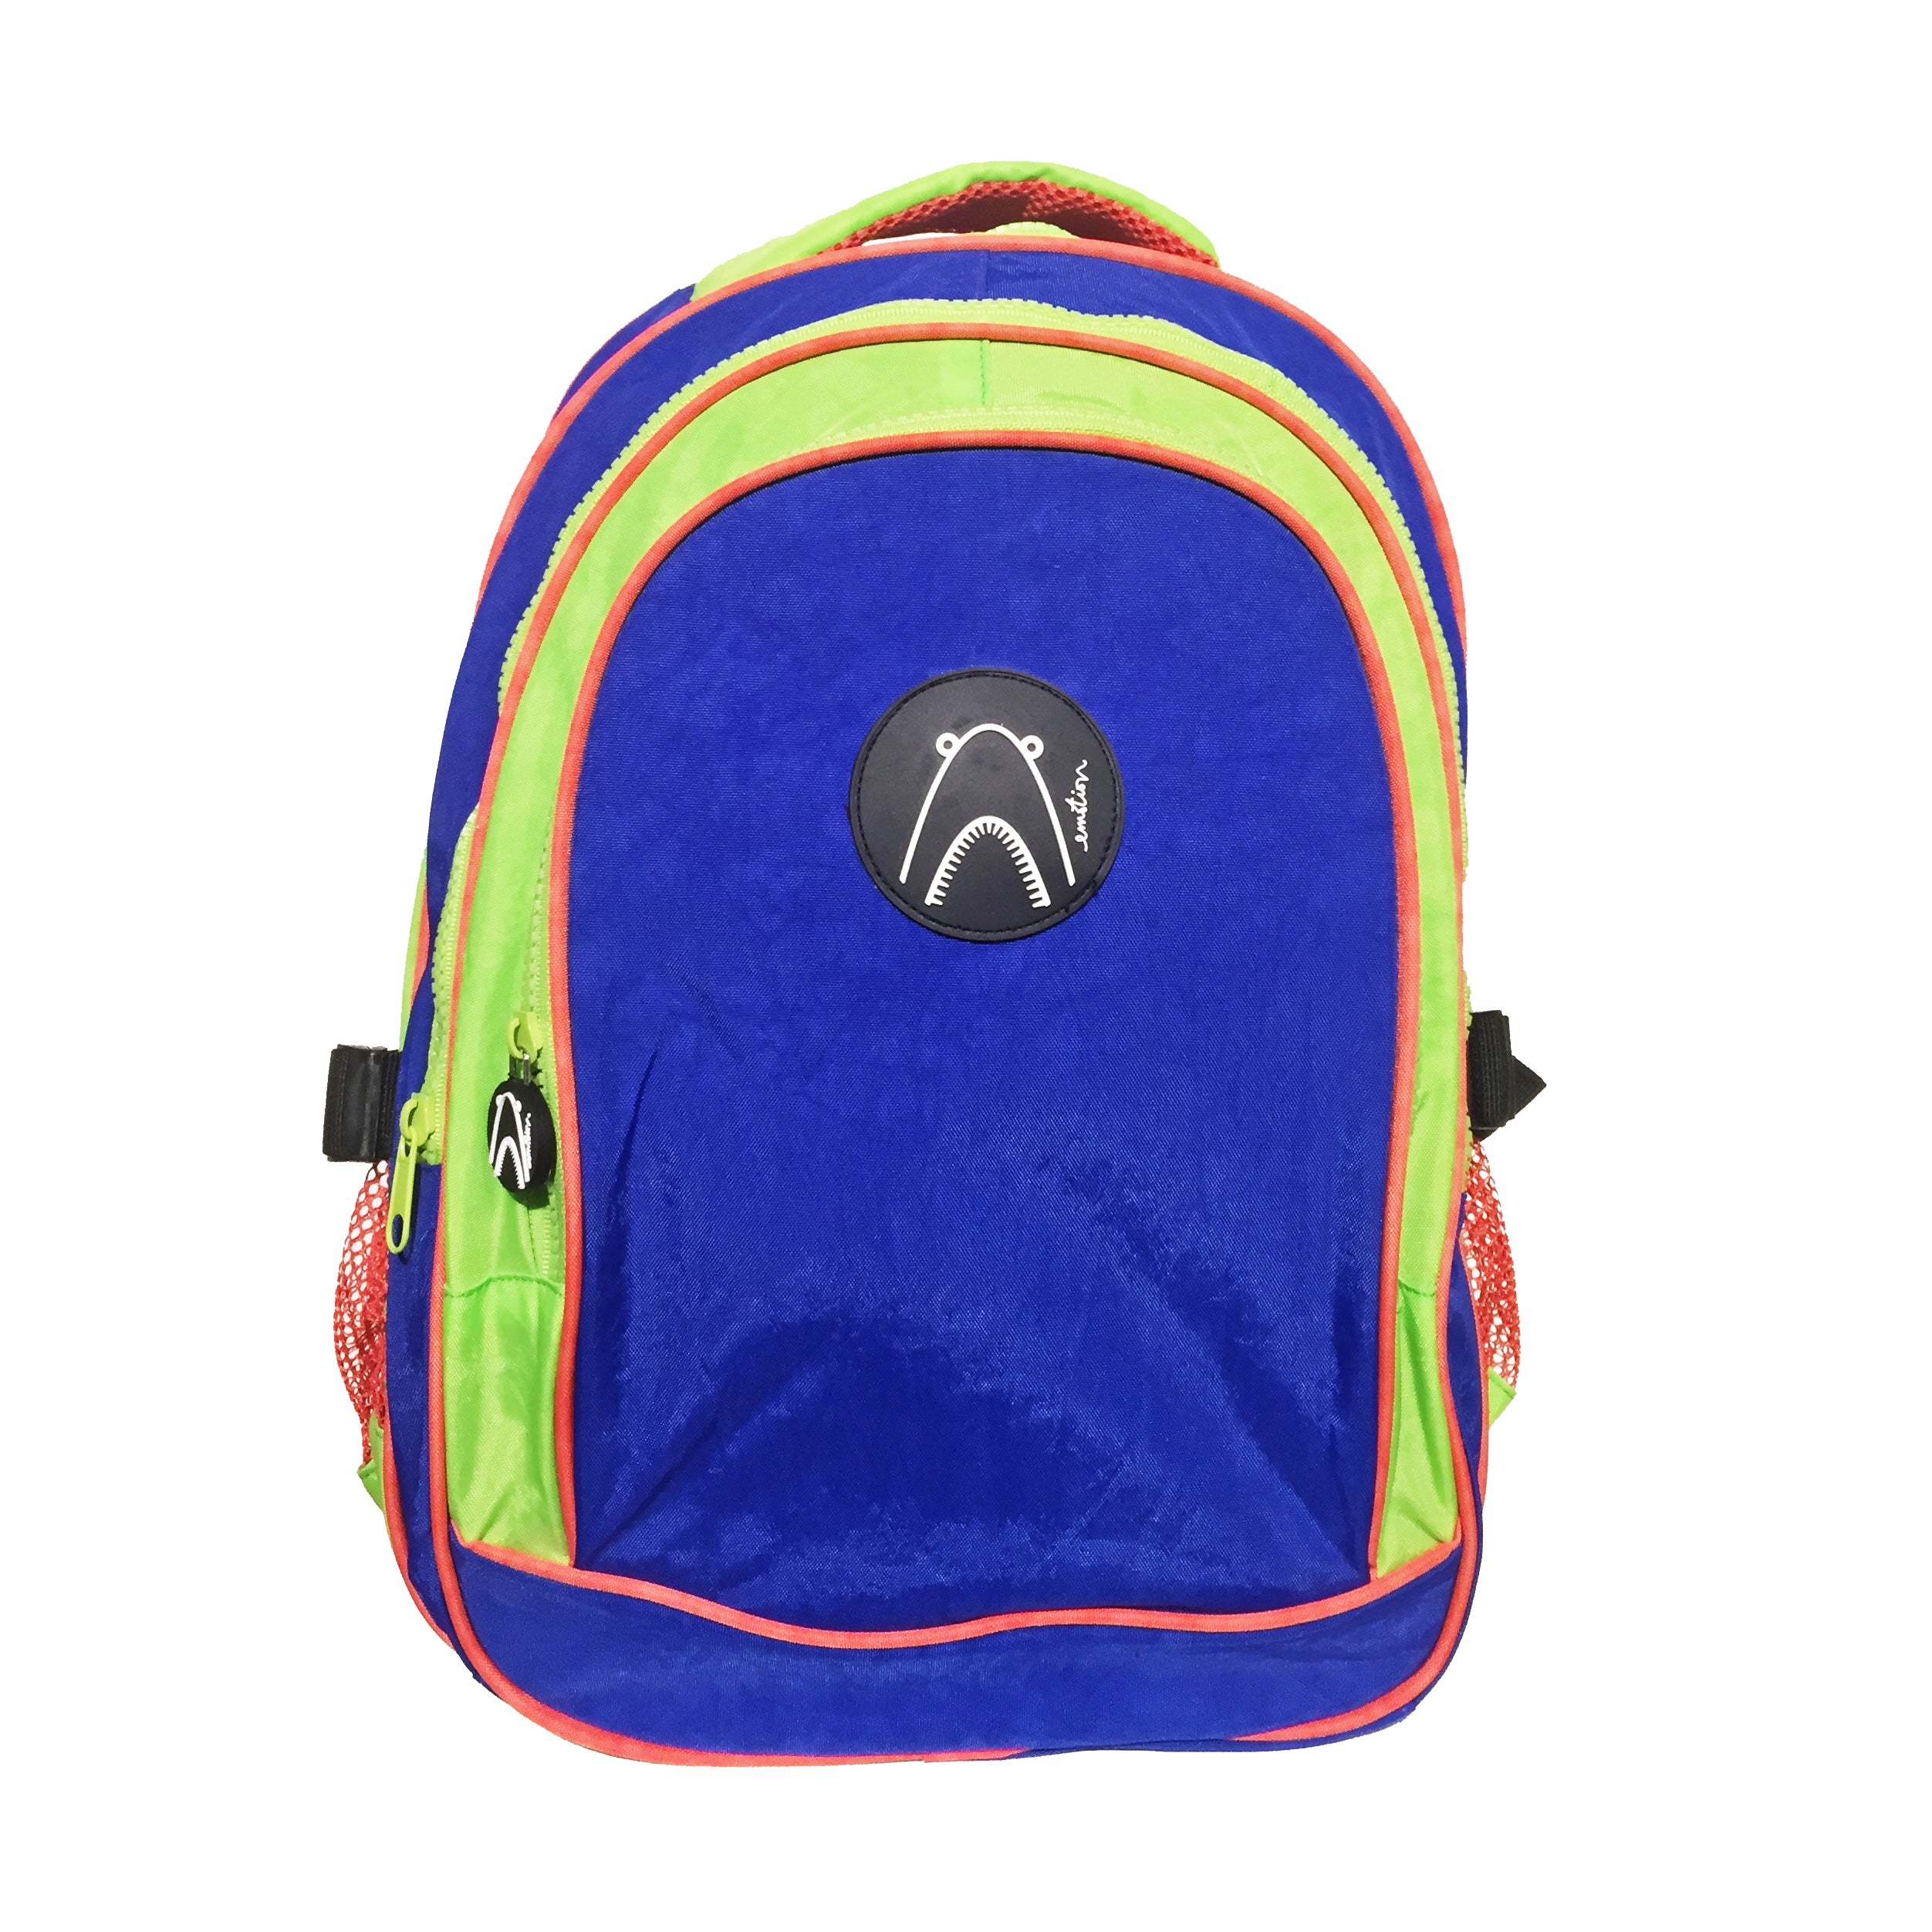 Love Bigme Small Shark Backpack (Small - Multi-colored), ...